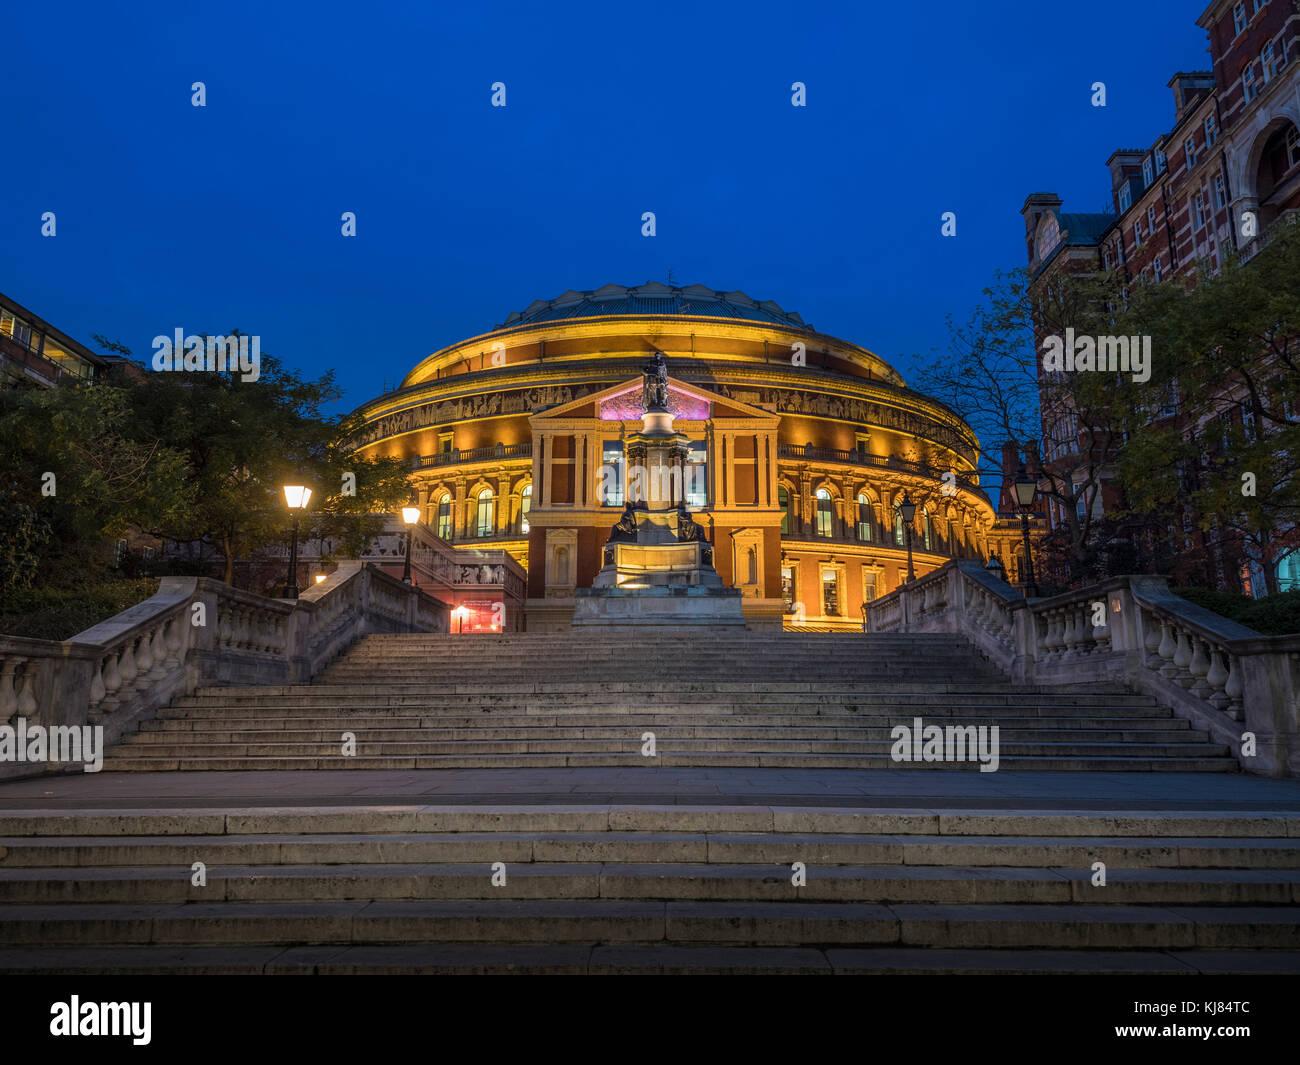 Queen Elizabeth II Diamond Jubilee Steps, Royal Albert Hall, London, UK at dusk - Stock Image